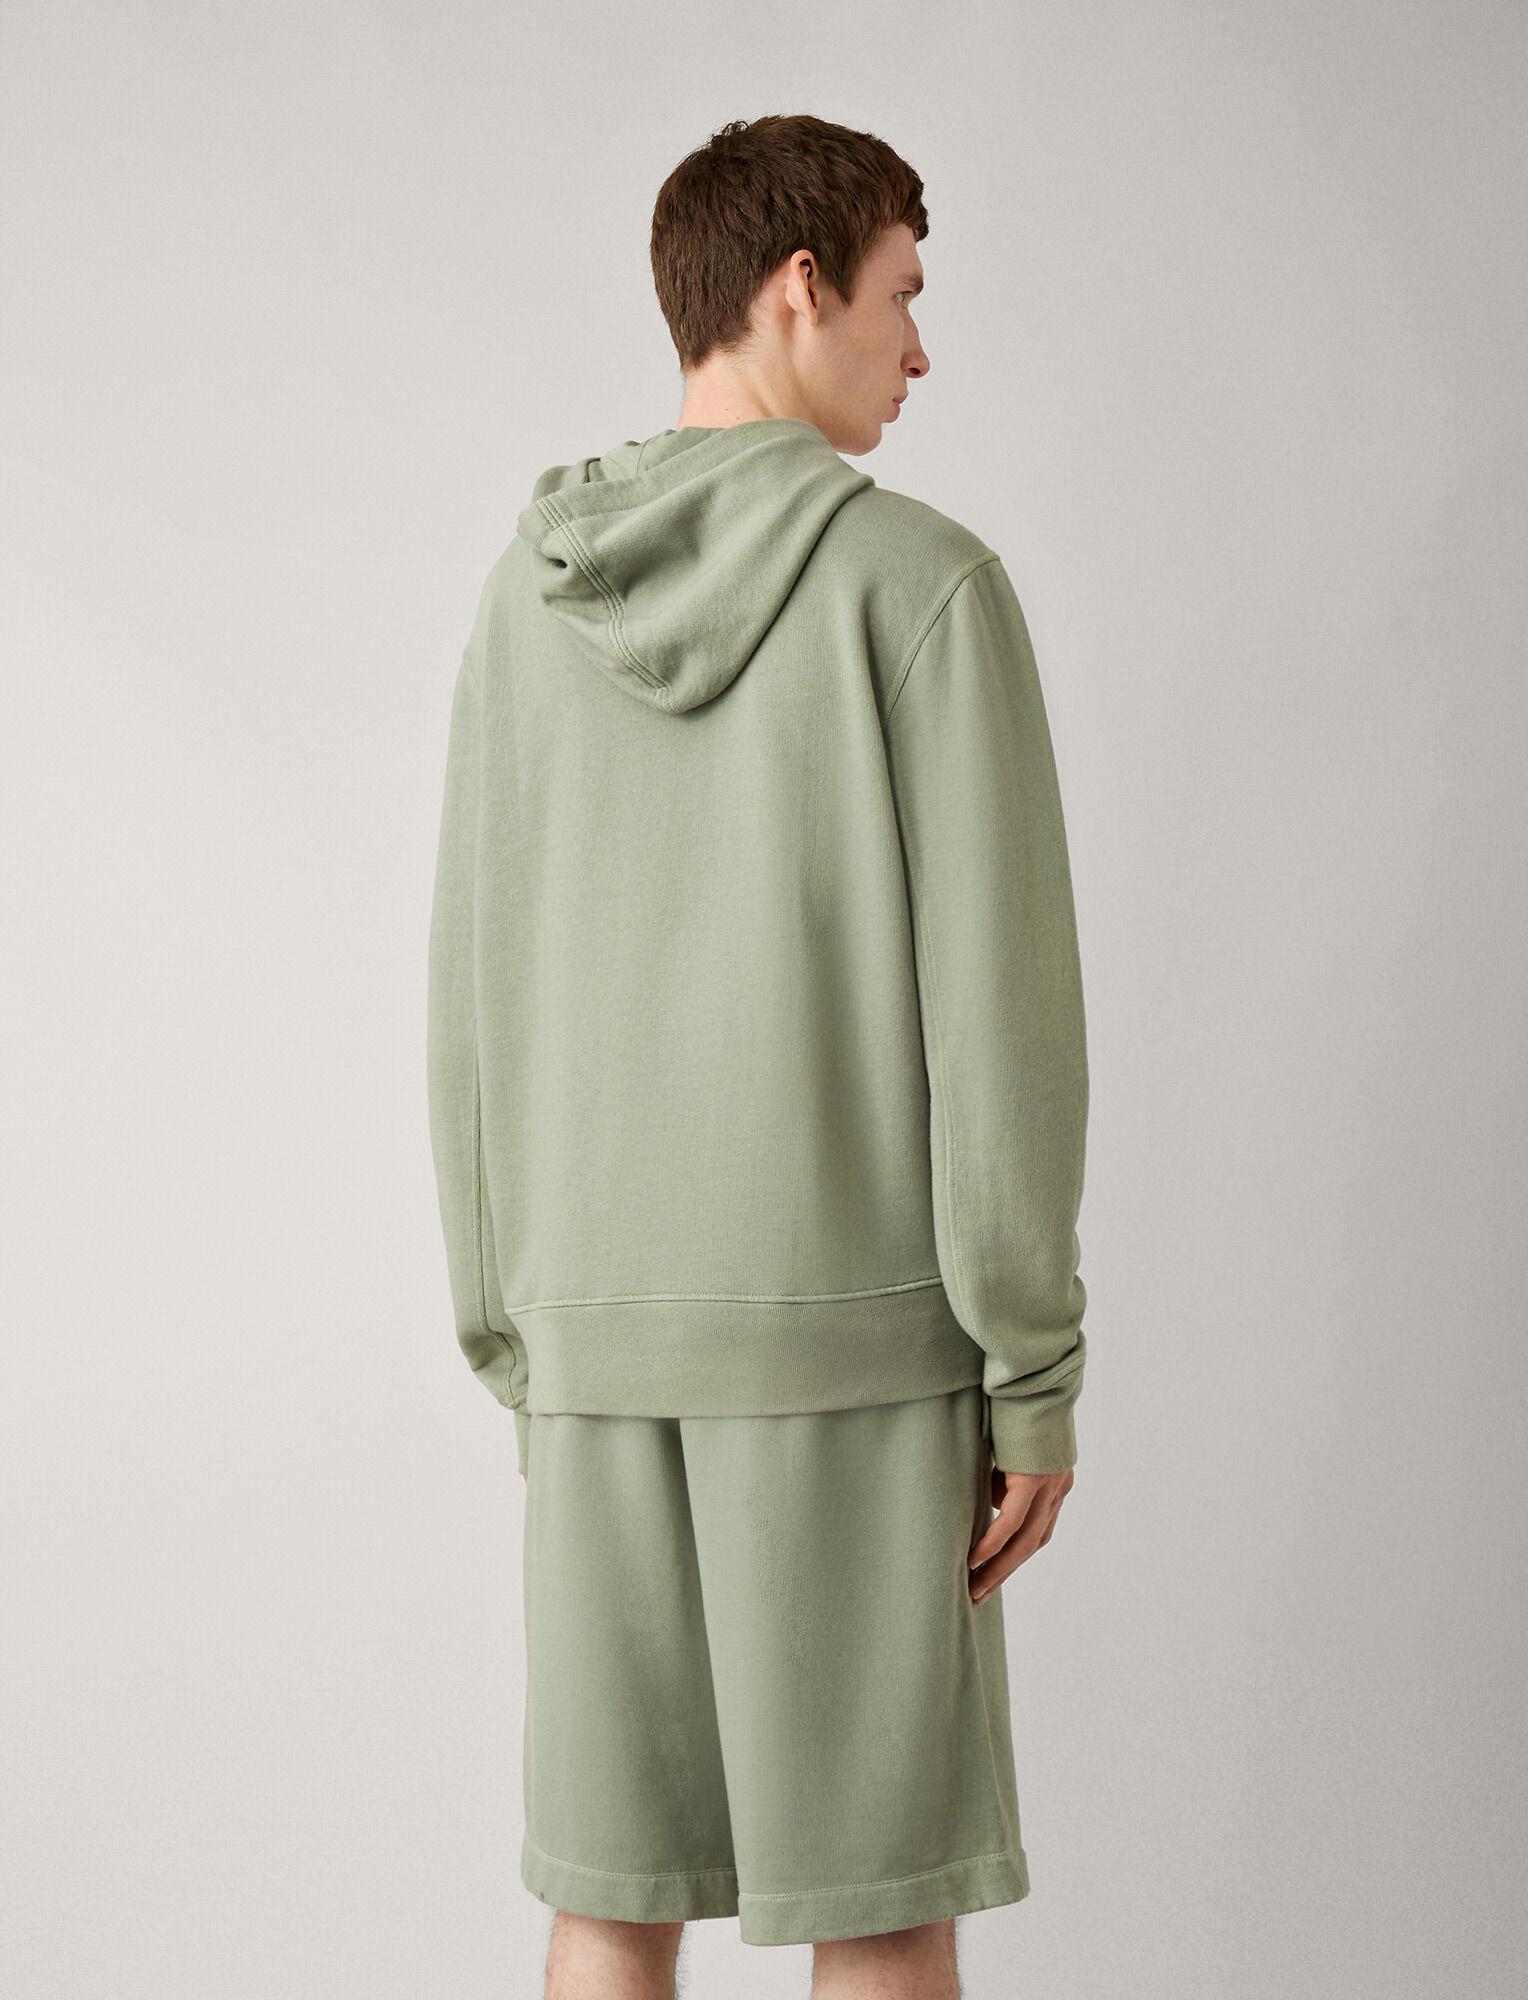 Joseph, Hoody Garment Dye Molleton Jersey, in KHAKI